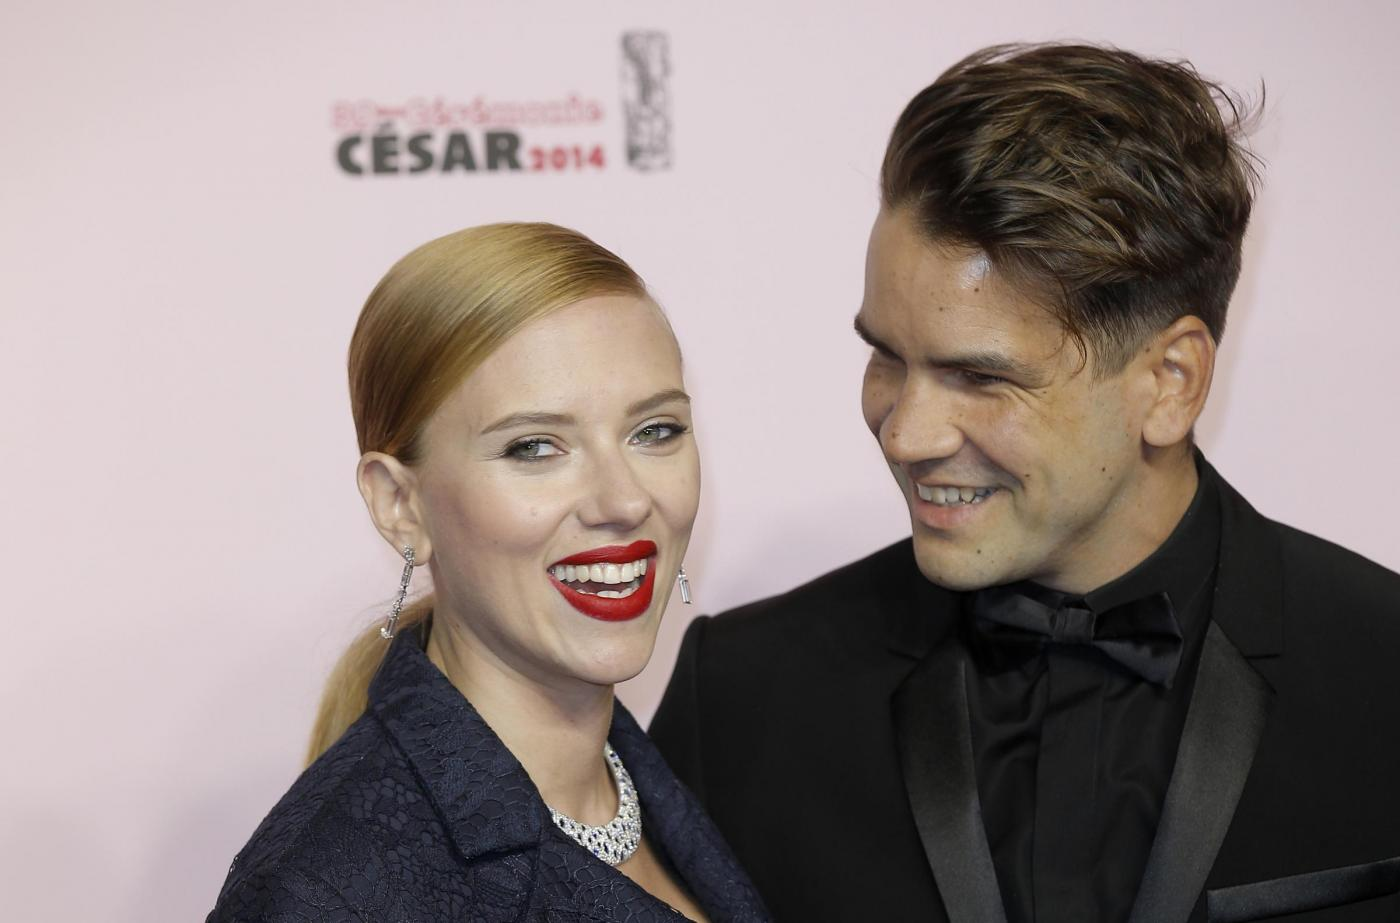 Scarlett Johansson e Romain Dauriac: sposi in gran segreto?